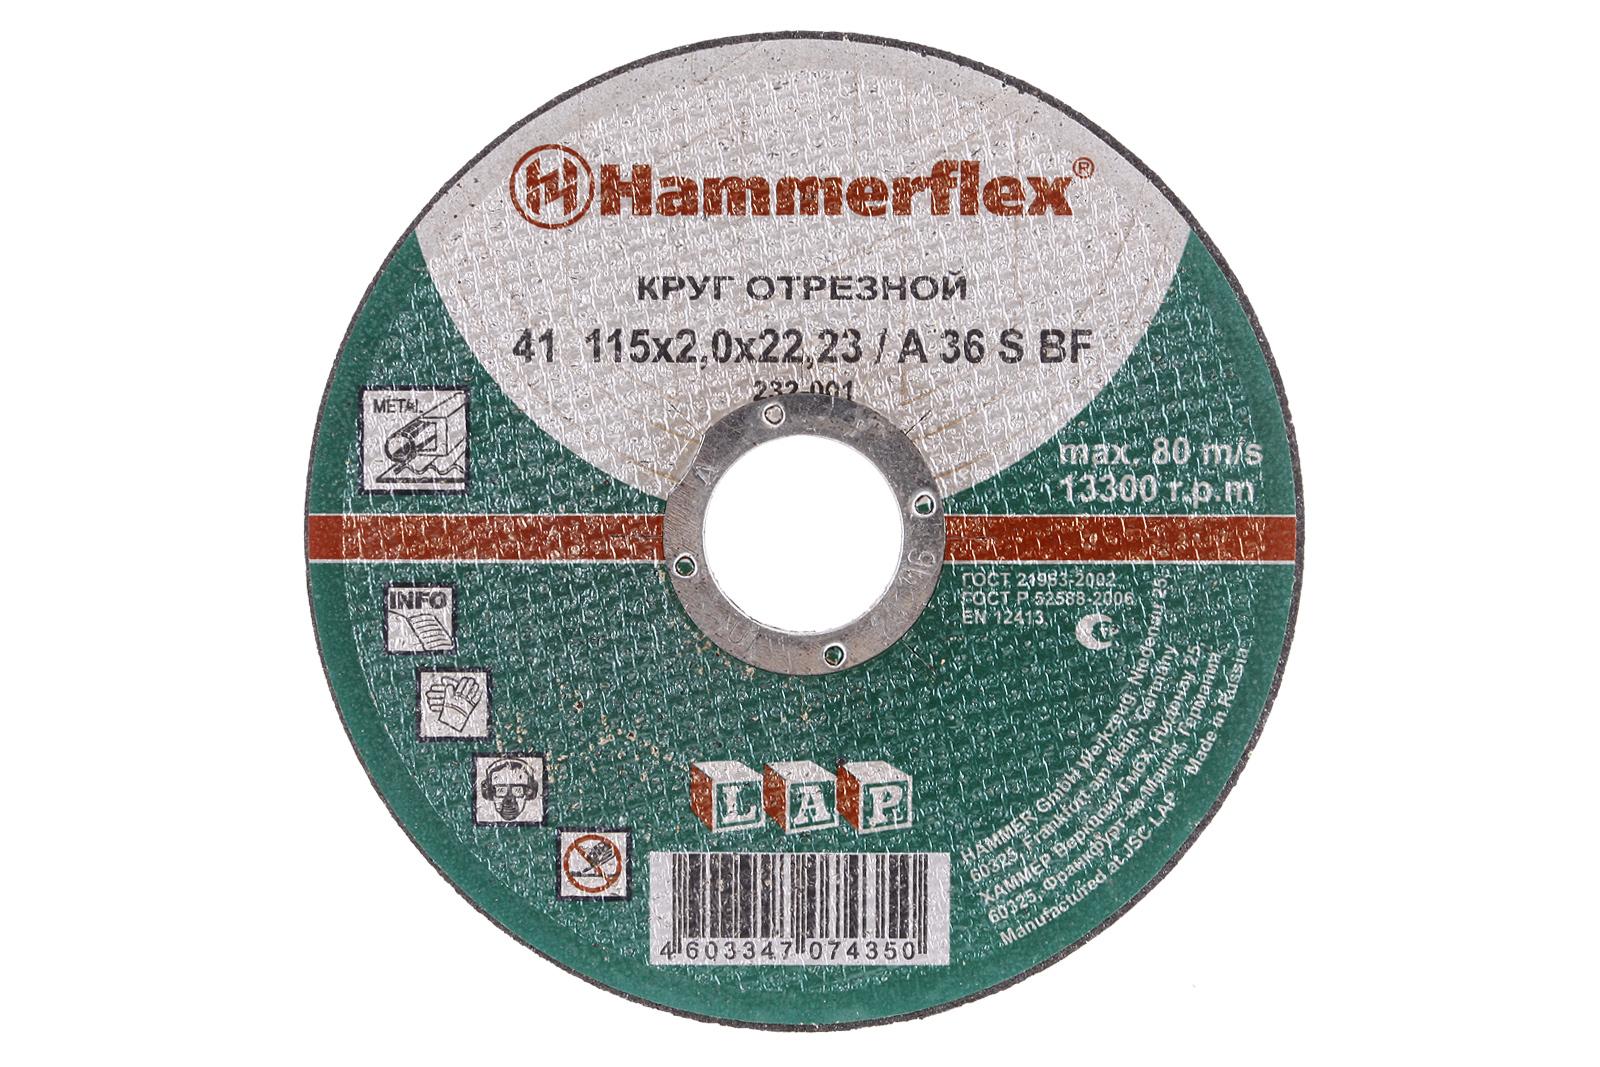 Круг отрезной Hammer 115 x 2.0 x 22 по металлу Коробка (200шт.) круг отрезной hitachi а24 115 х 1 2 х 22 по металлу 50шт